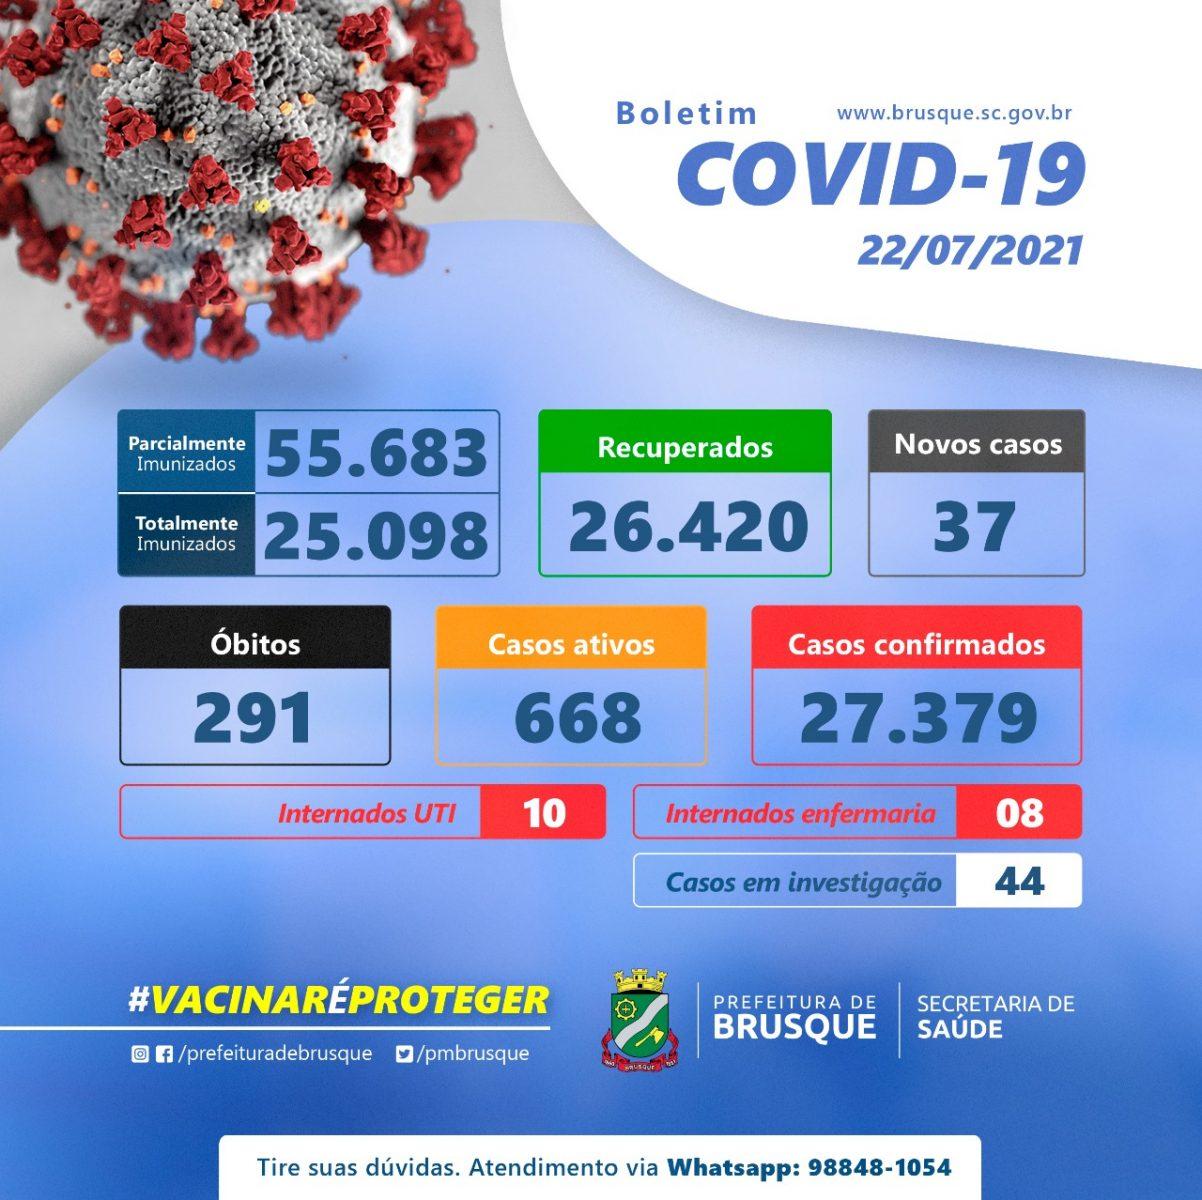 Covid-19: Confira o boletim epidemiológico desta quinta-feira (22)